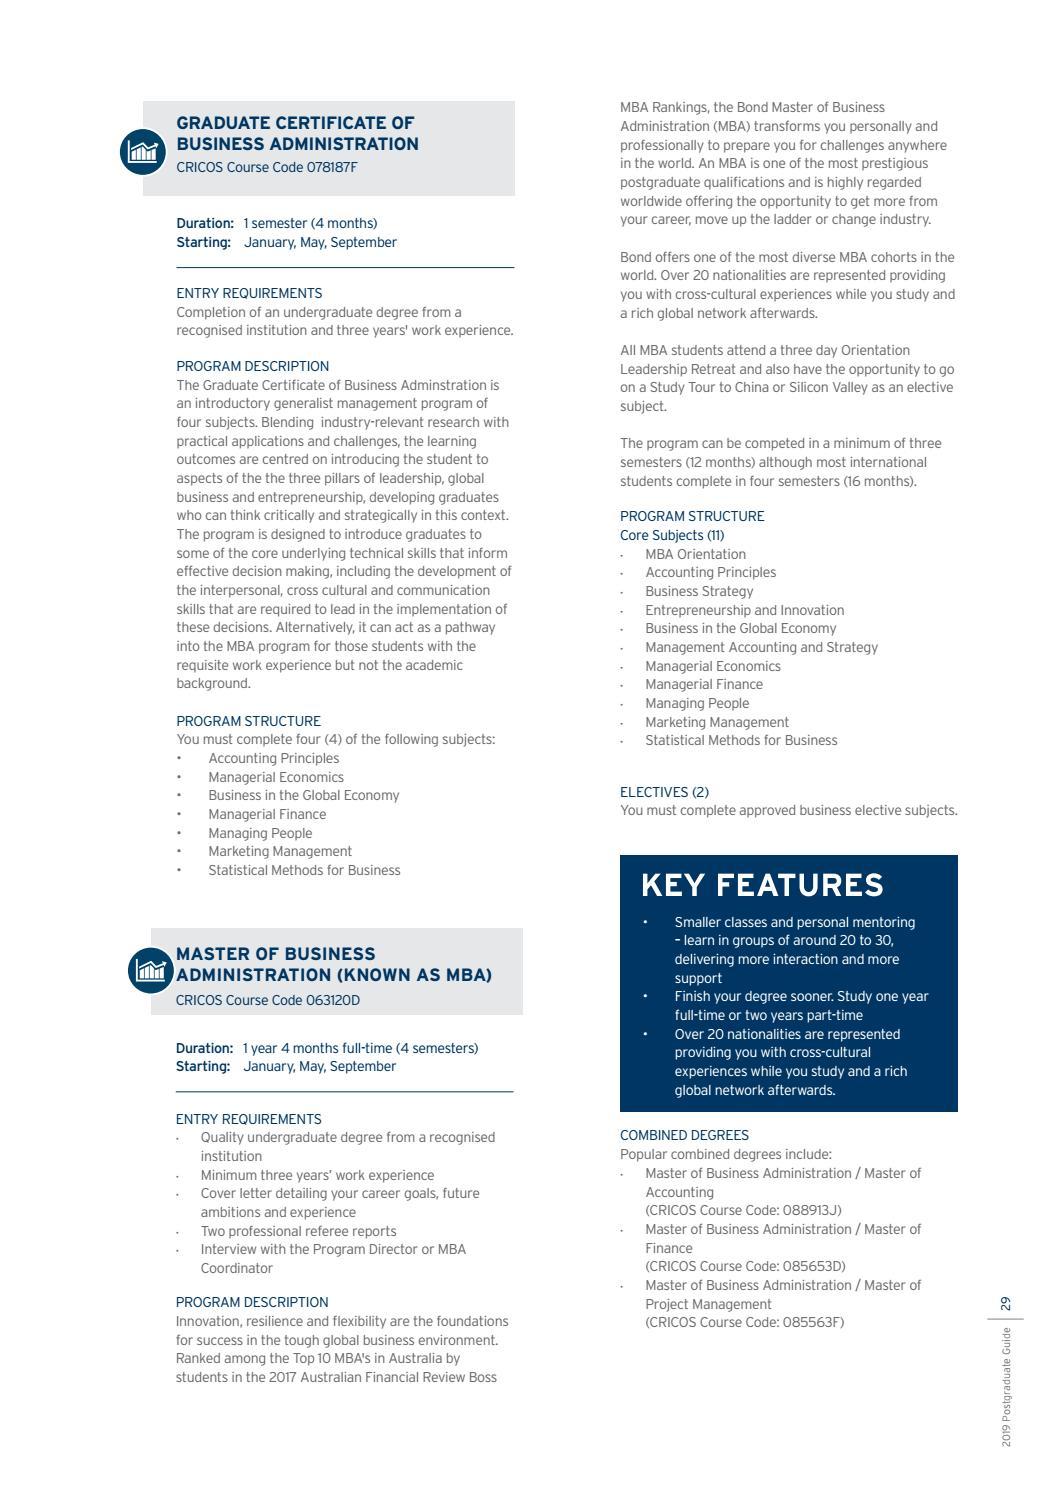 Bond university postgraduate guide by bond university issuu 1betcityfo Images